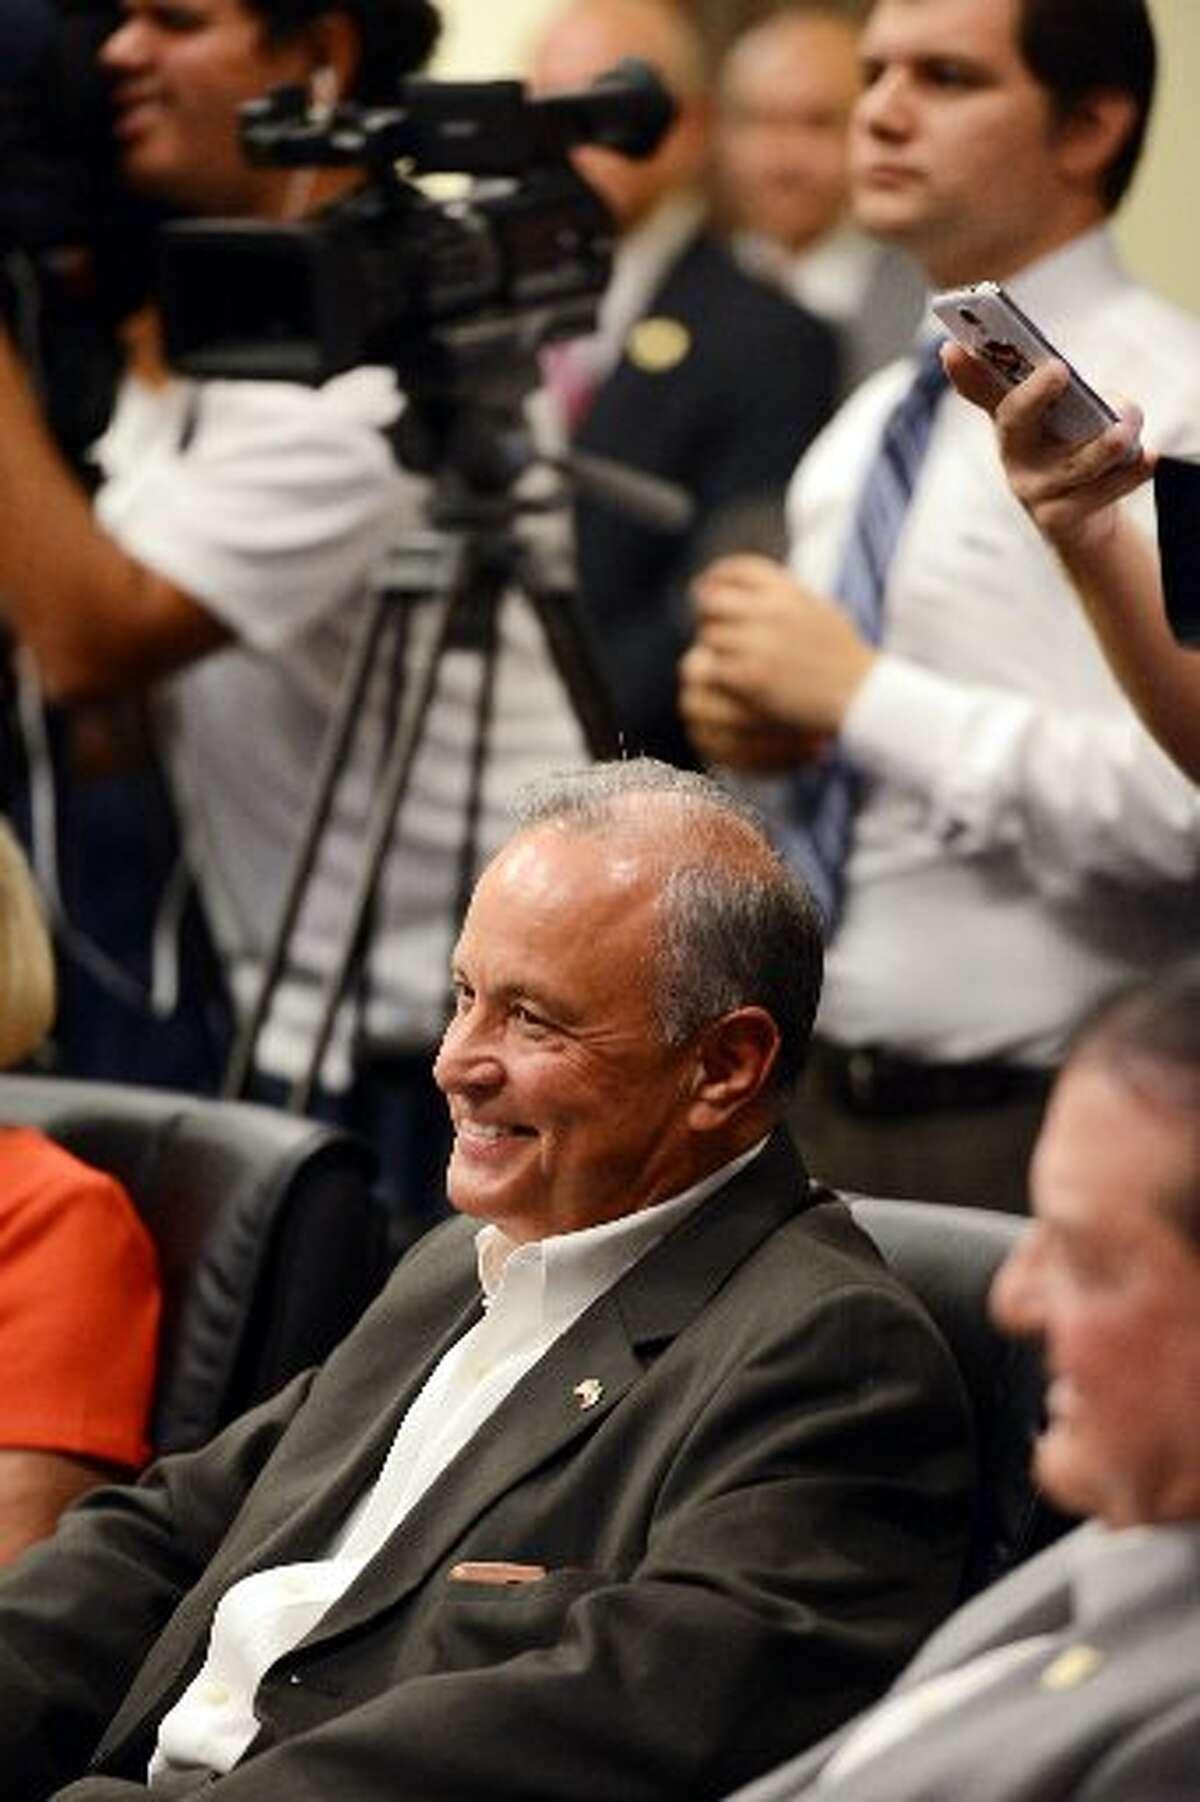 (AP Photo/The Brownsville Herald, Brad Doherty)